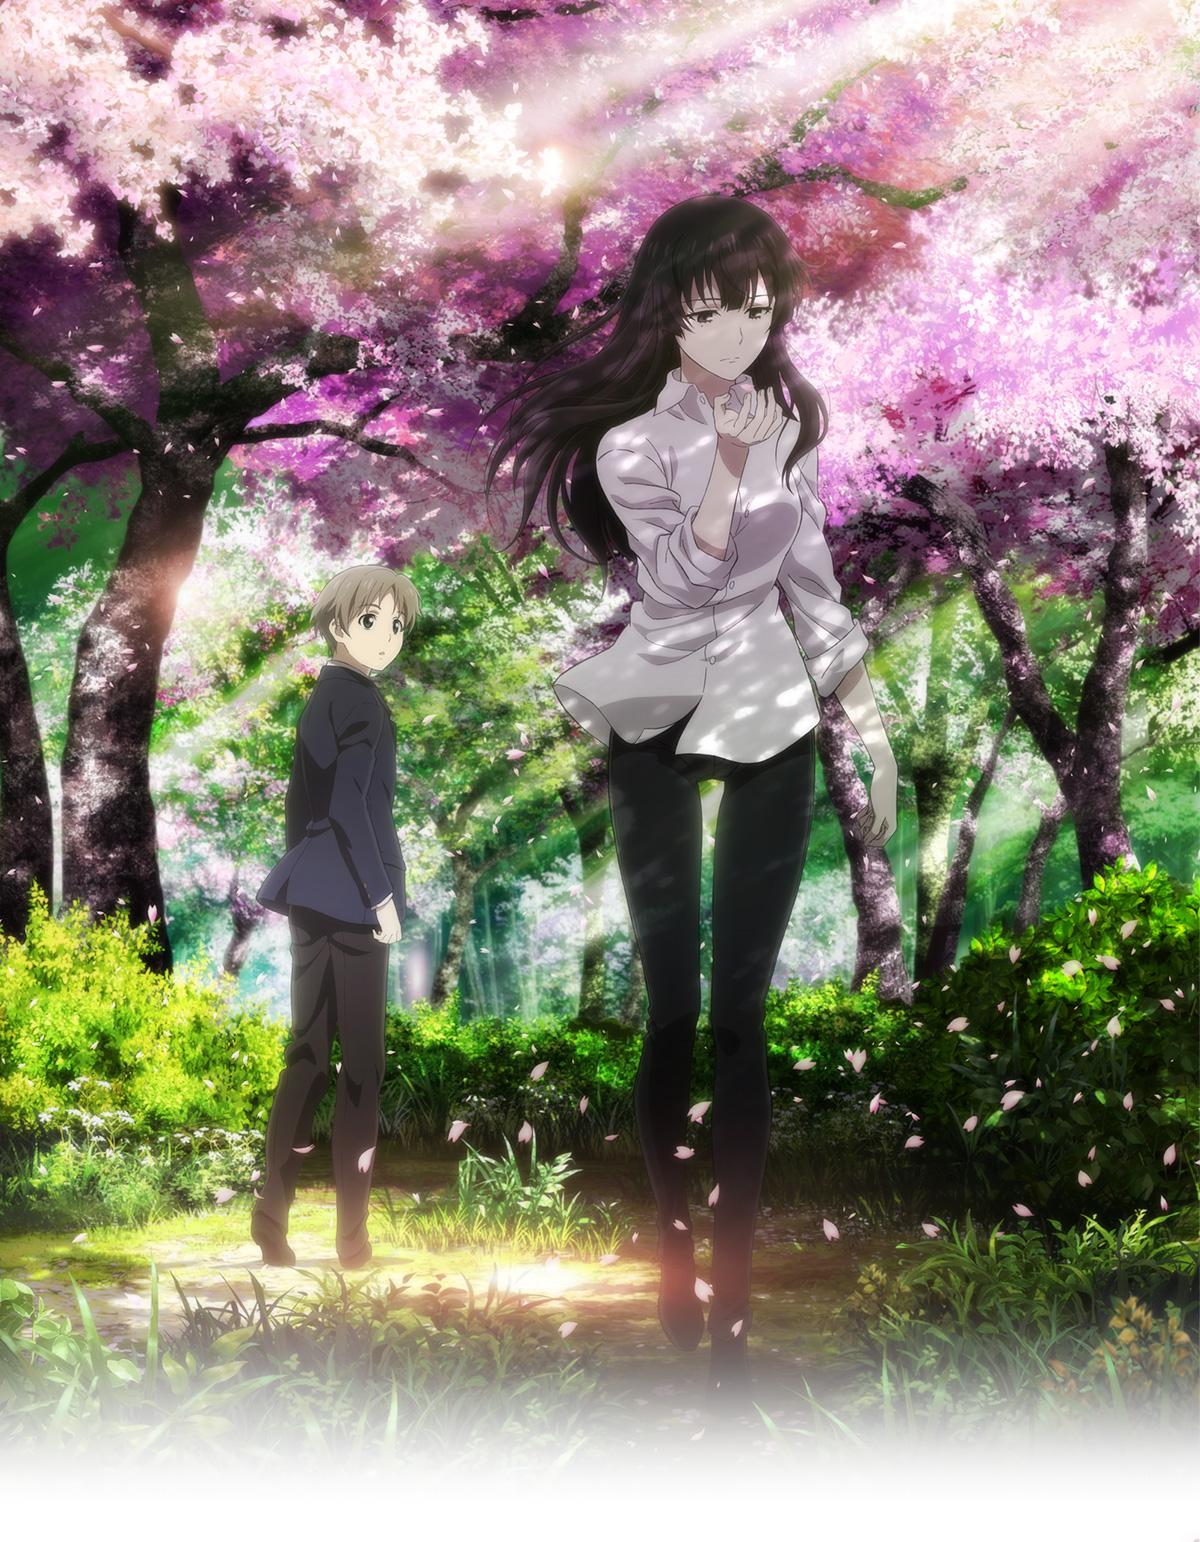 a_corpse_is_buried_under_sakurakos_feet_001.jpg